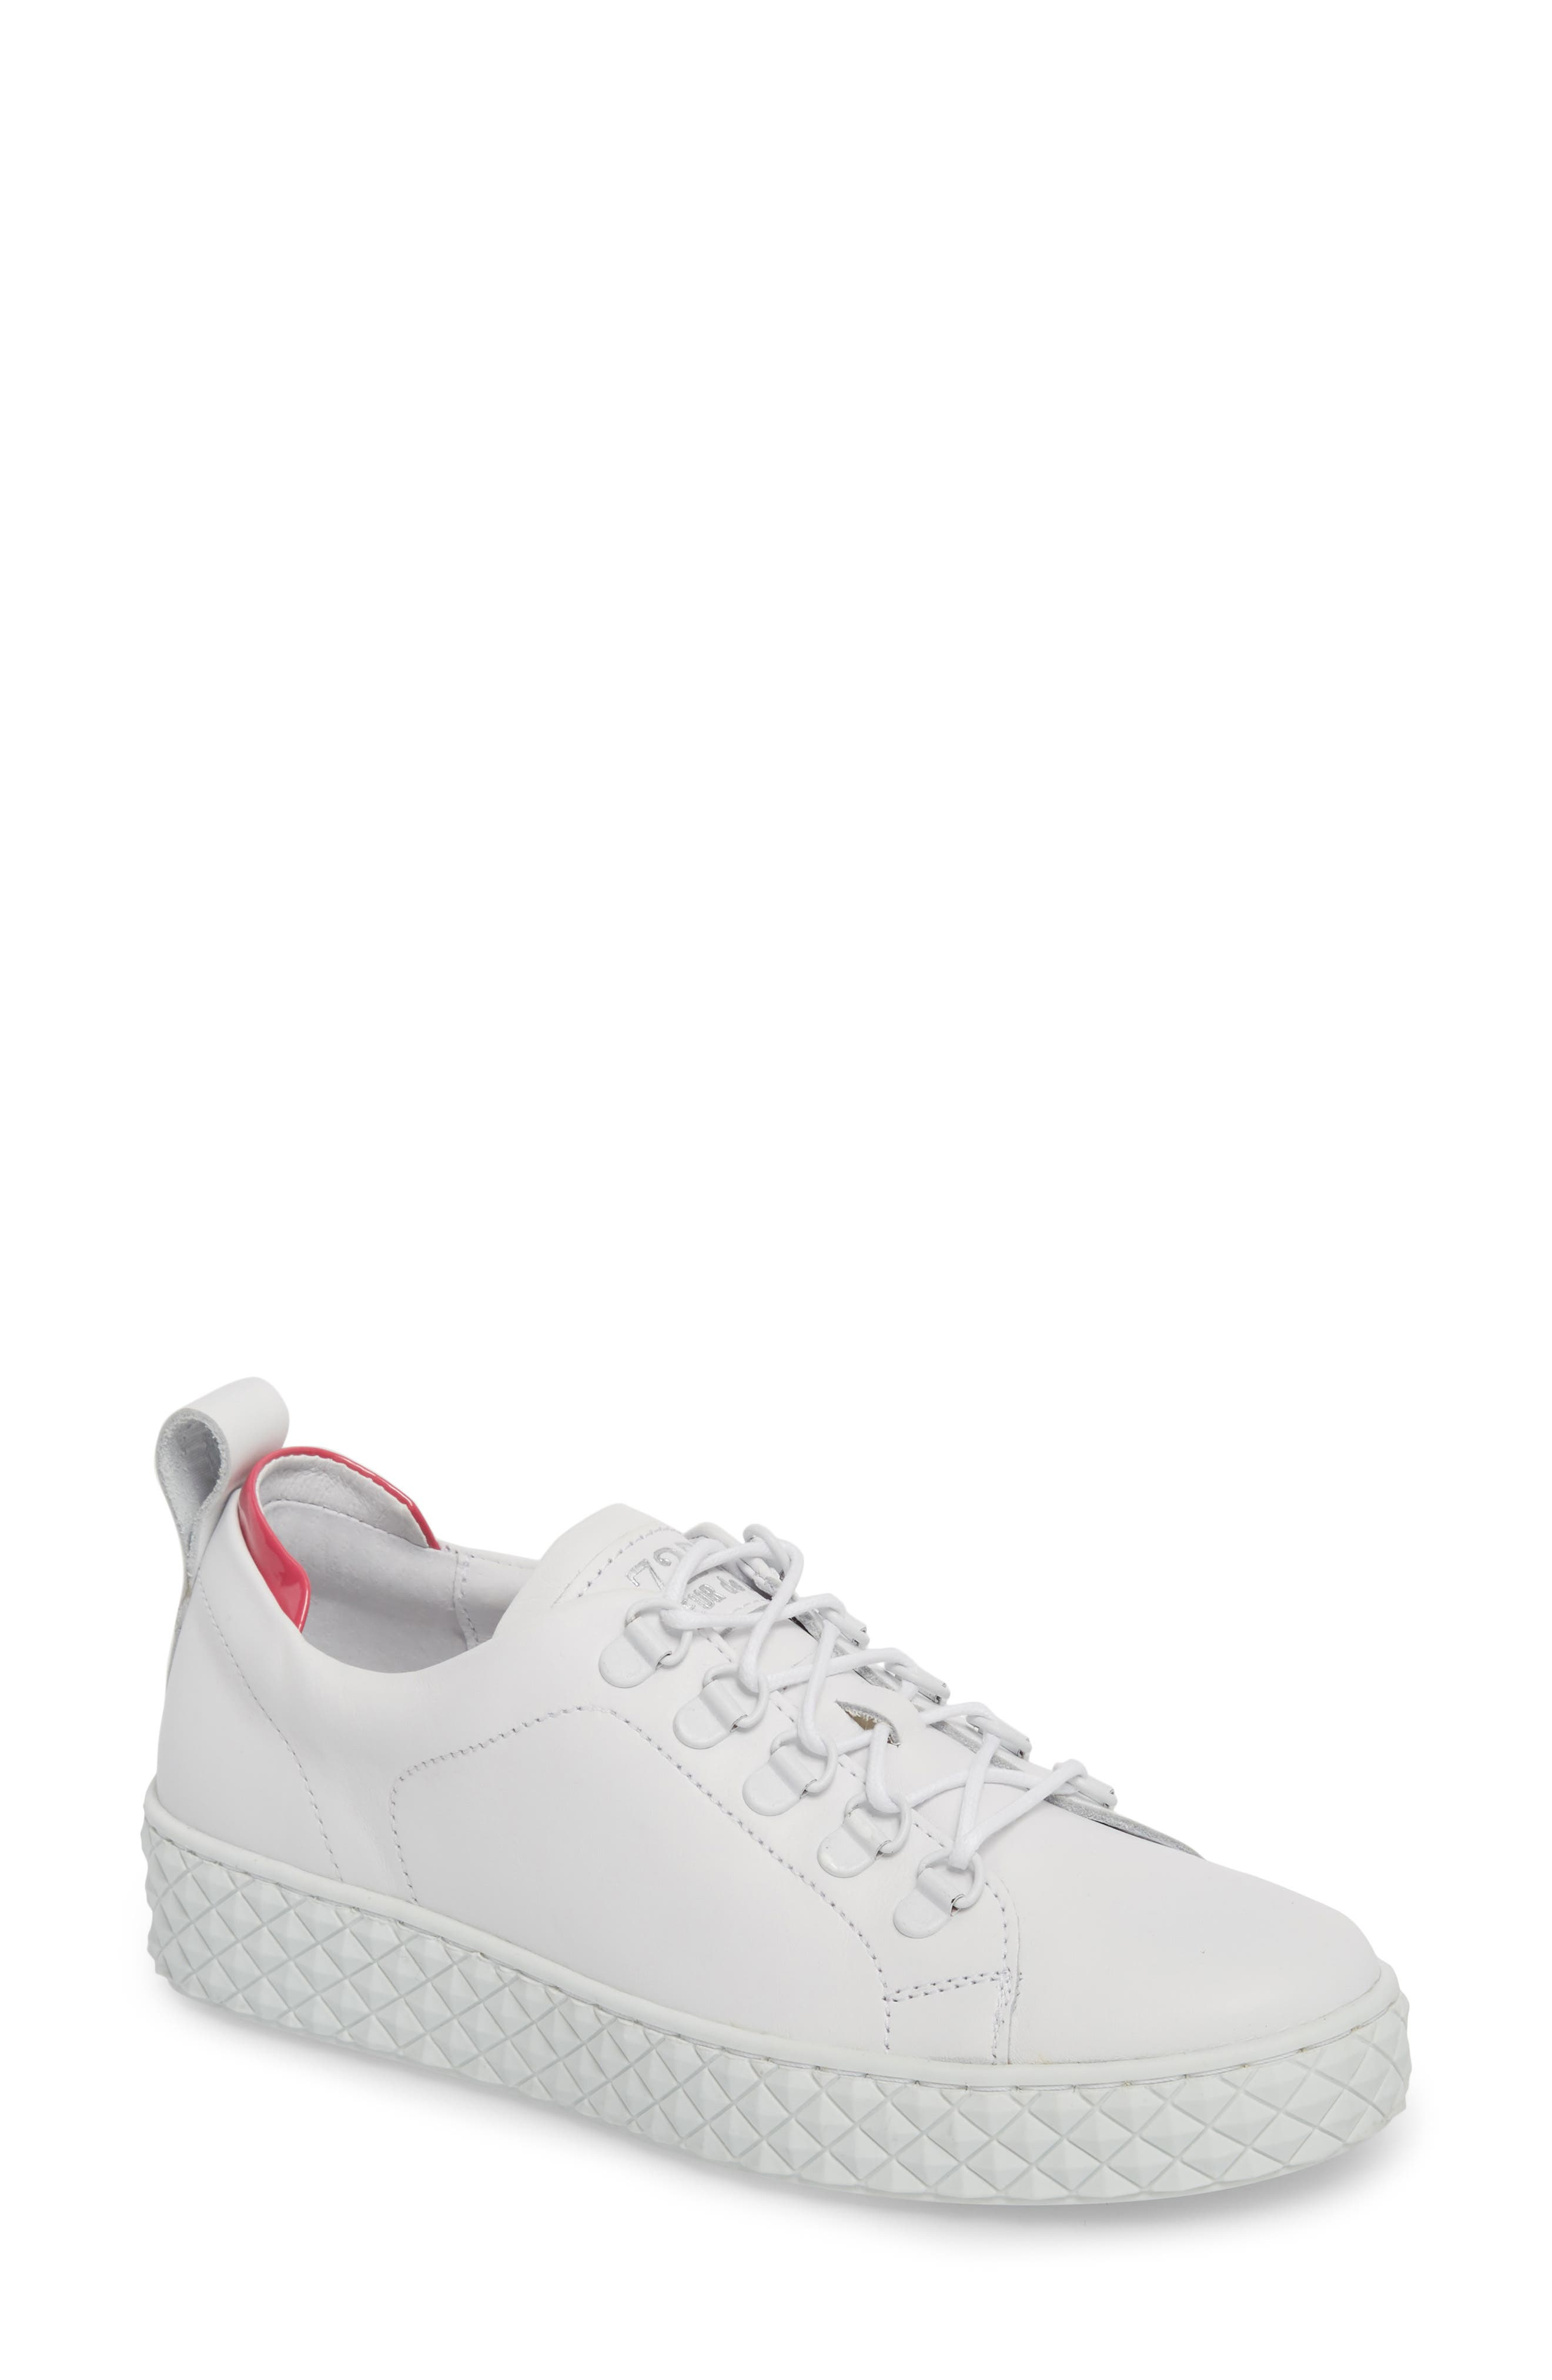 Sol Sneaker,                             Main thumbnail 1, color,                             Optic White/ Fuchsia Leather